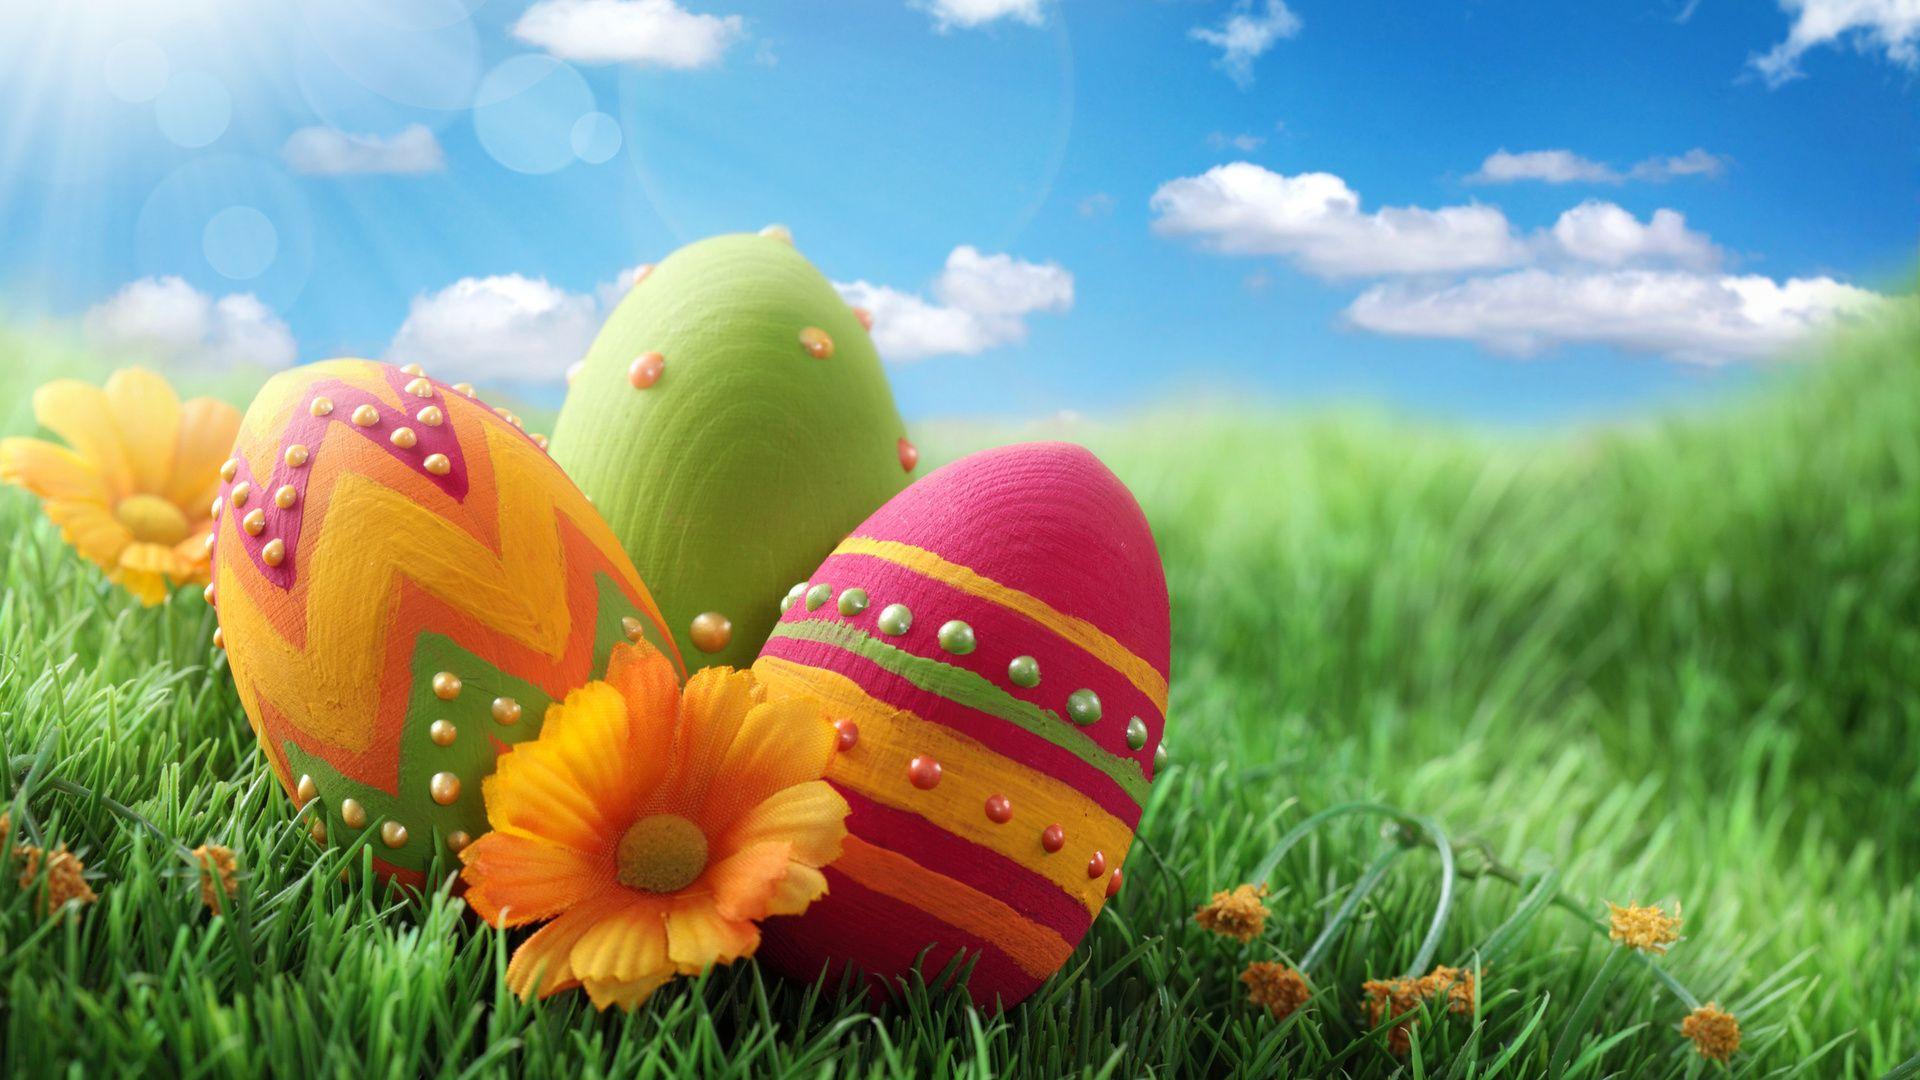 Easter Desktop Wallpapers Top Free Easter Desktop Backgrounds